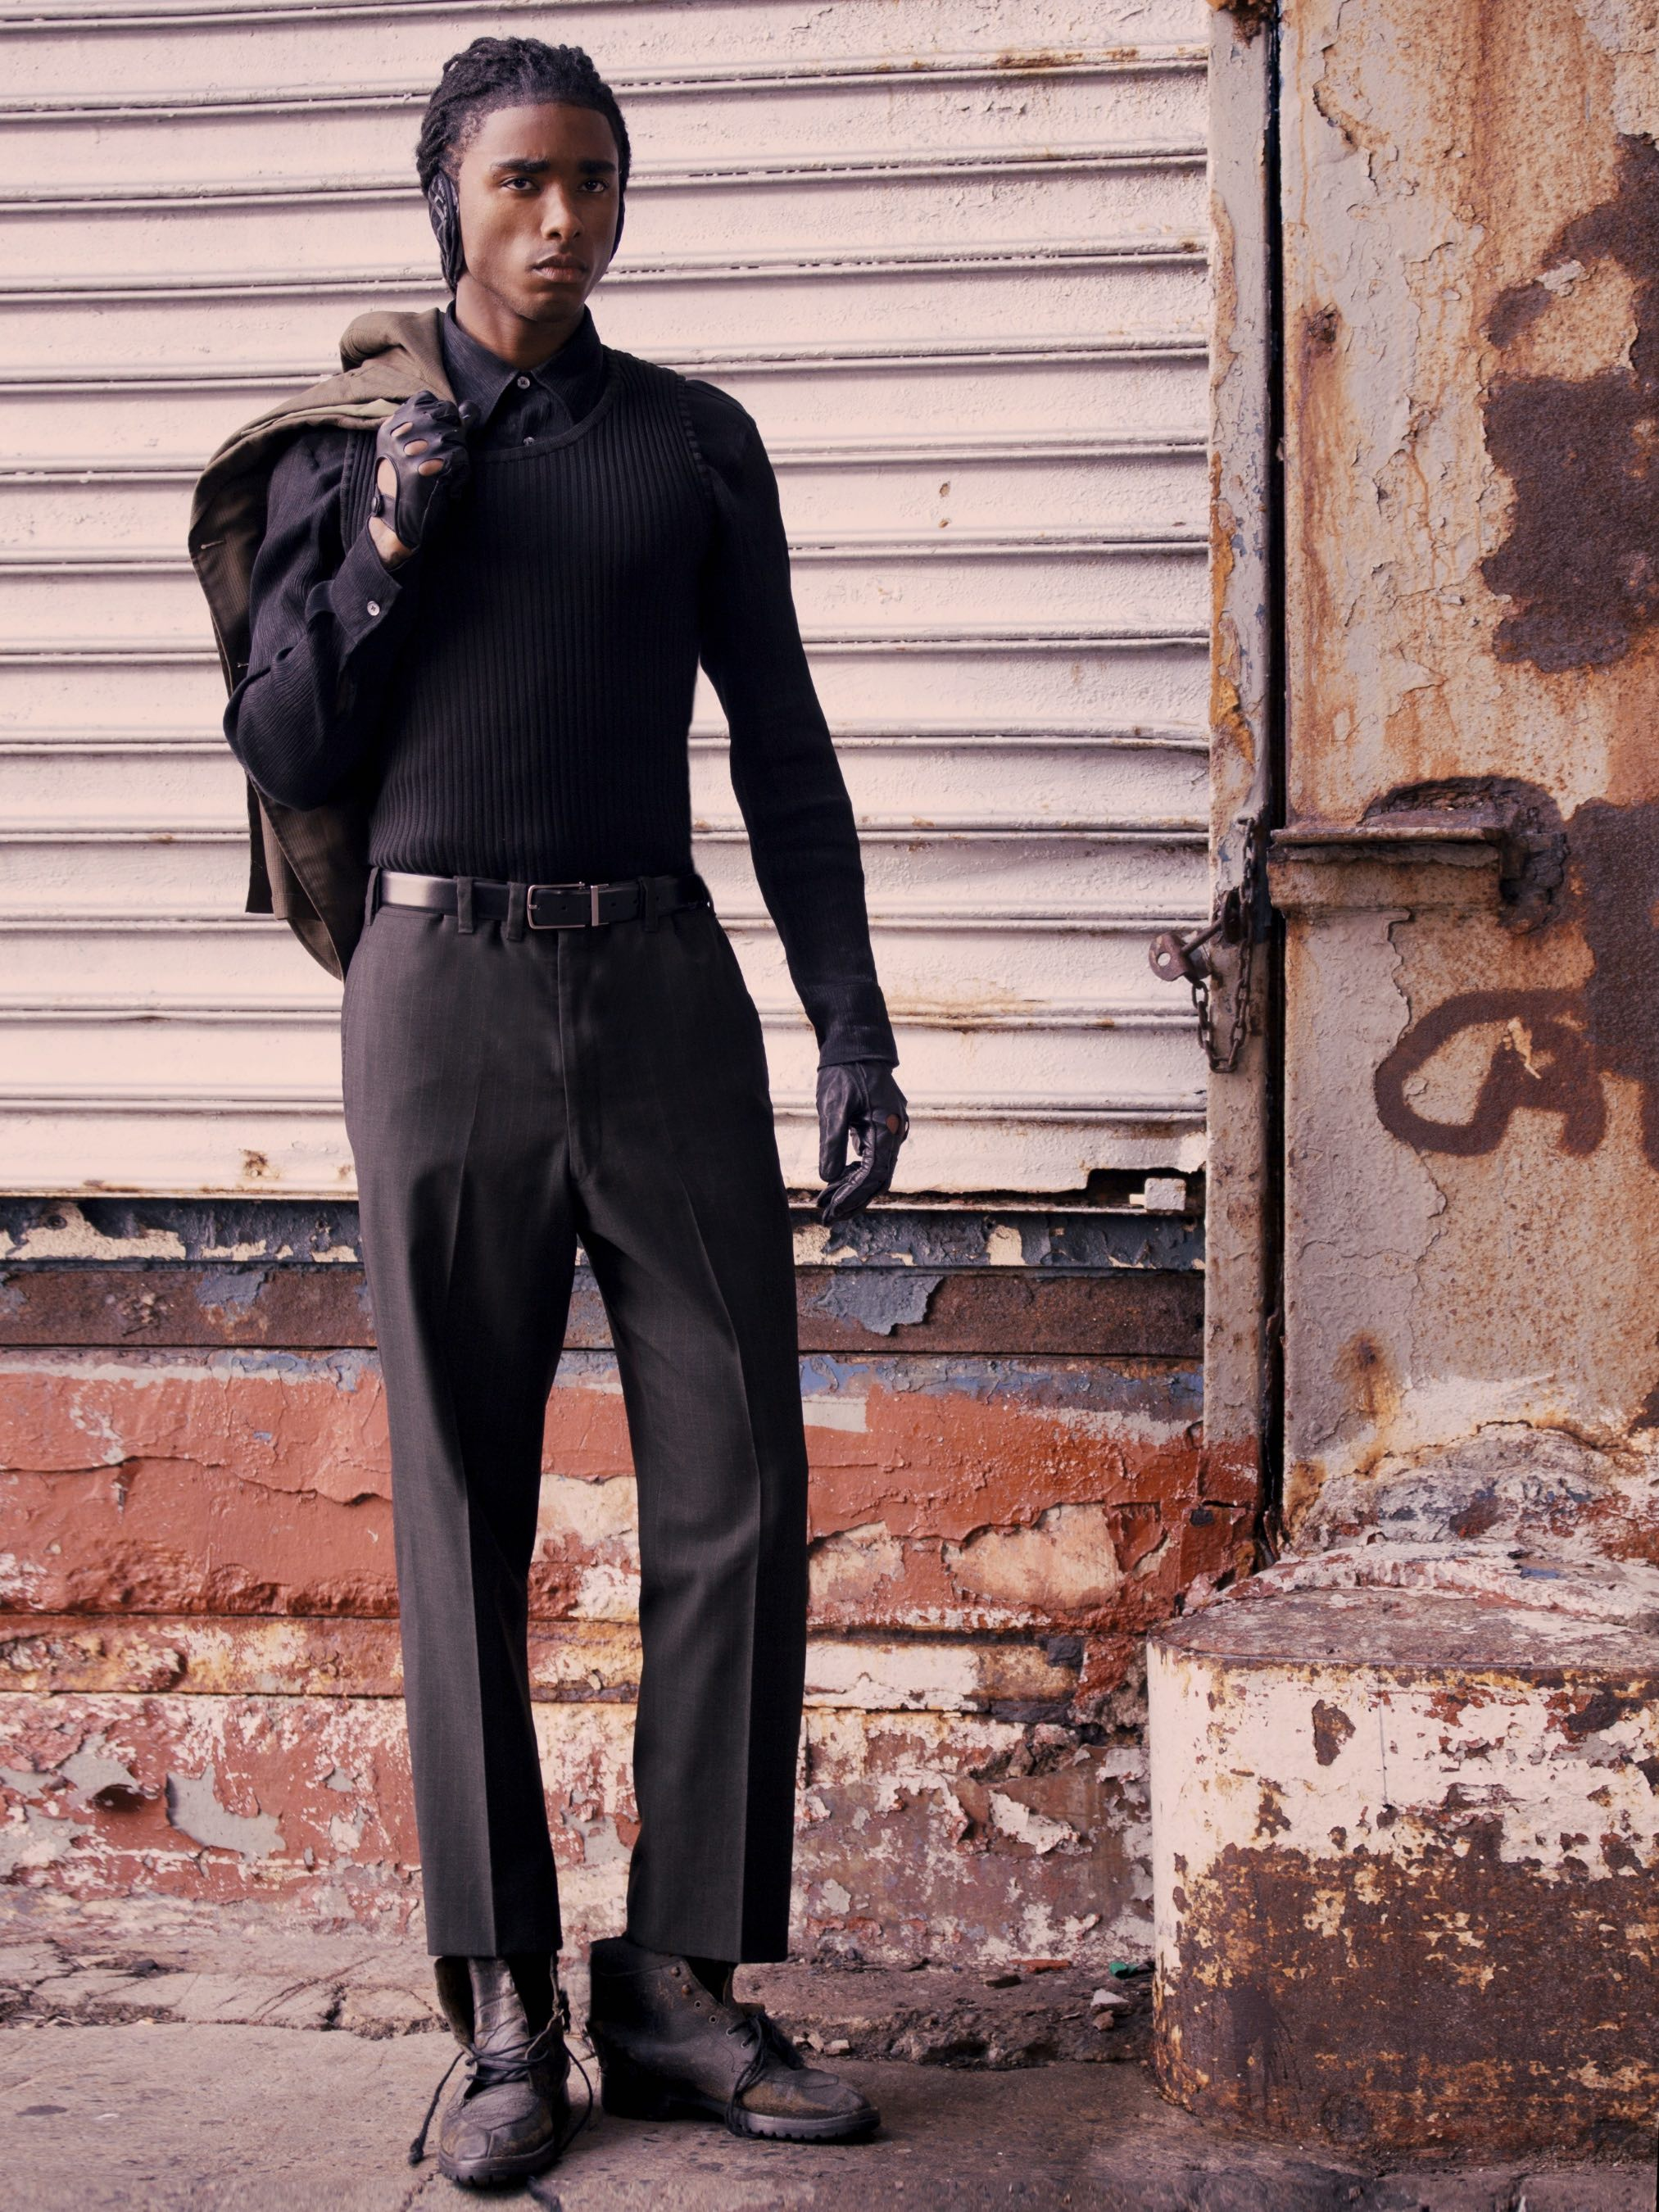 Web-Shine-Male-Model-NYC-Kevin-08.jpg#asset:51479